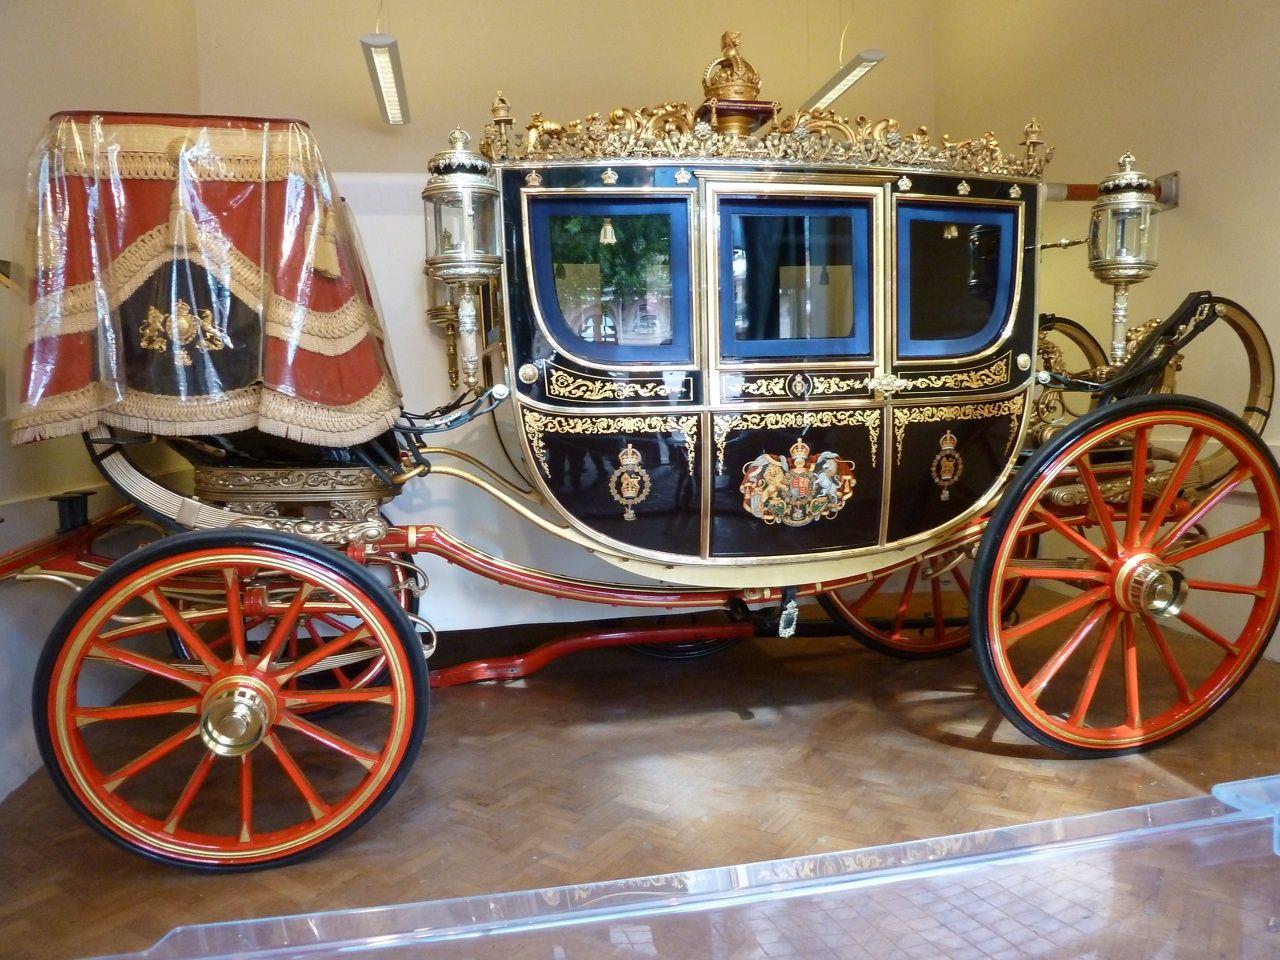 The Irish State Coach | Antique cars, Coach, Irish